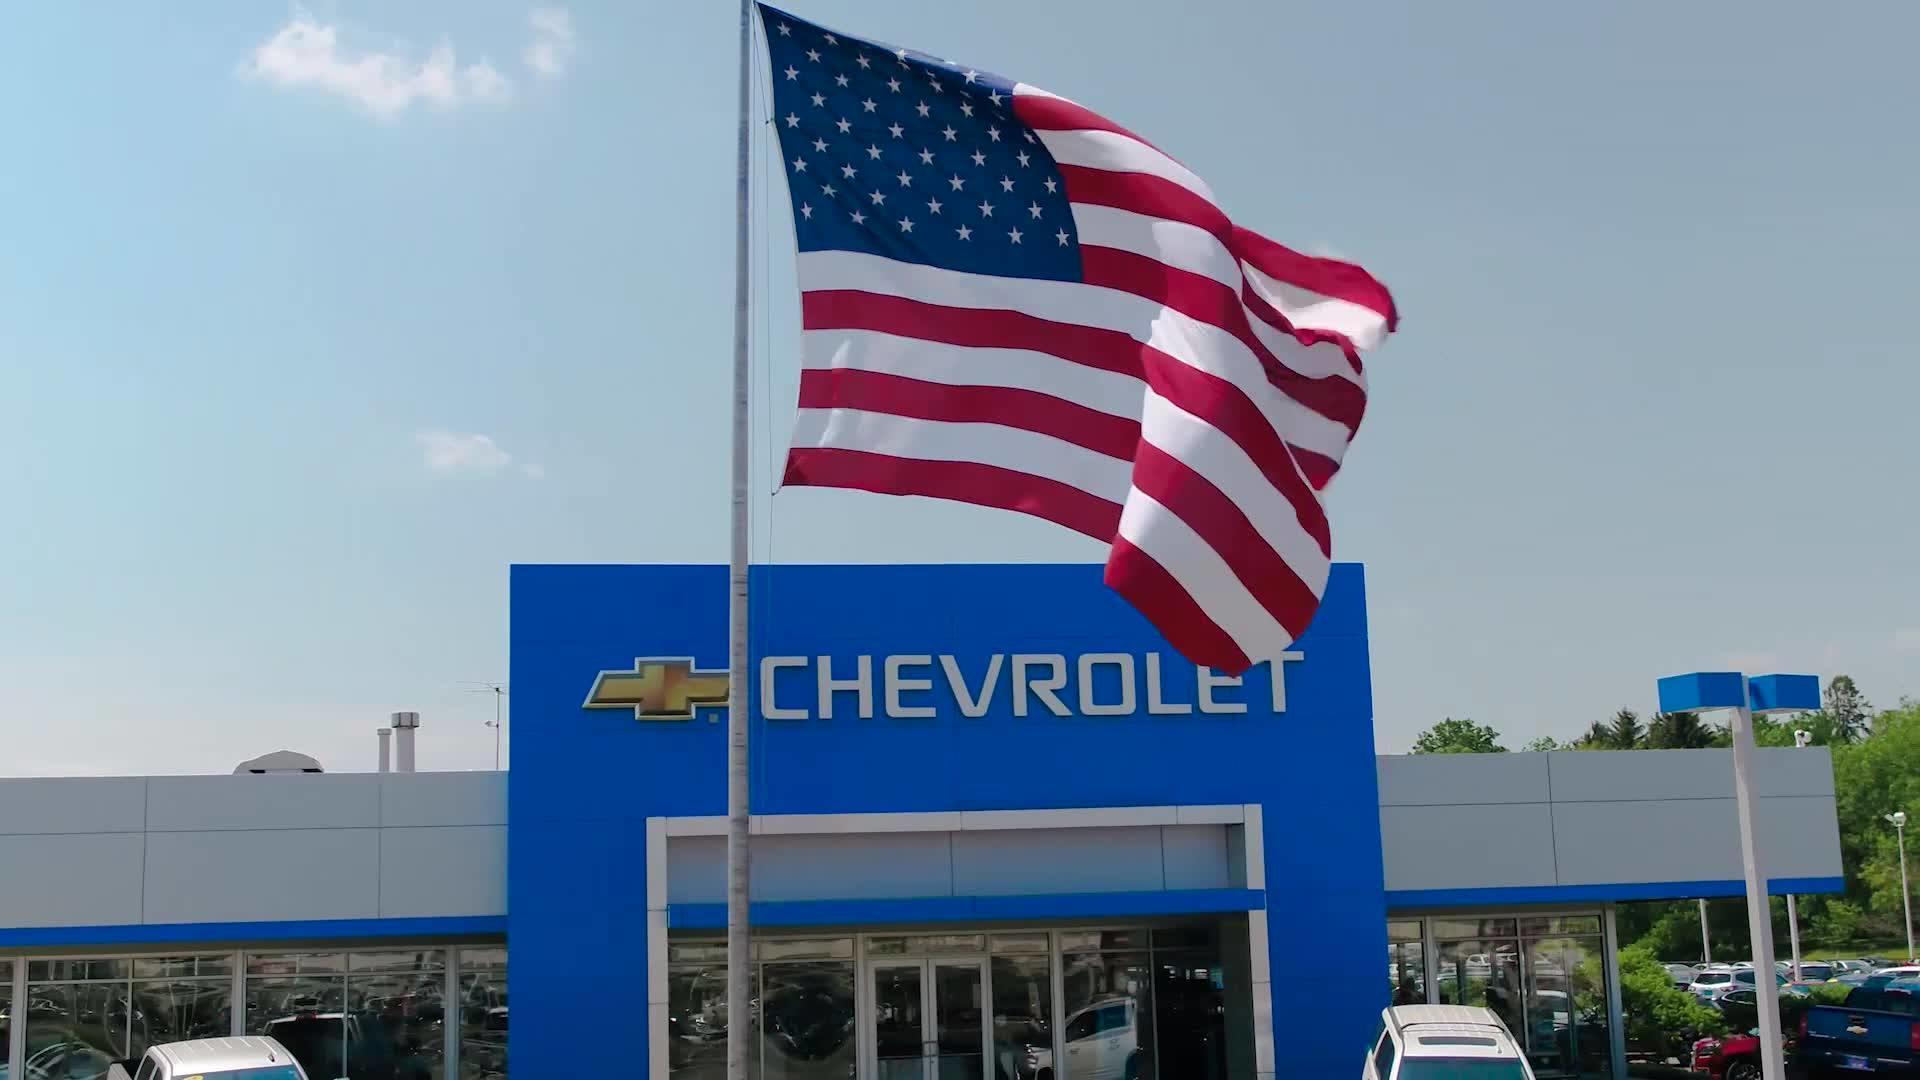 Libertyville Chevrolet image 2